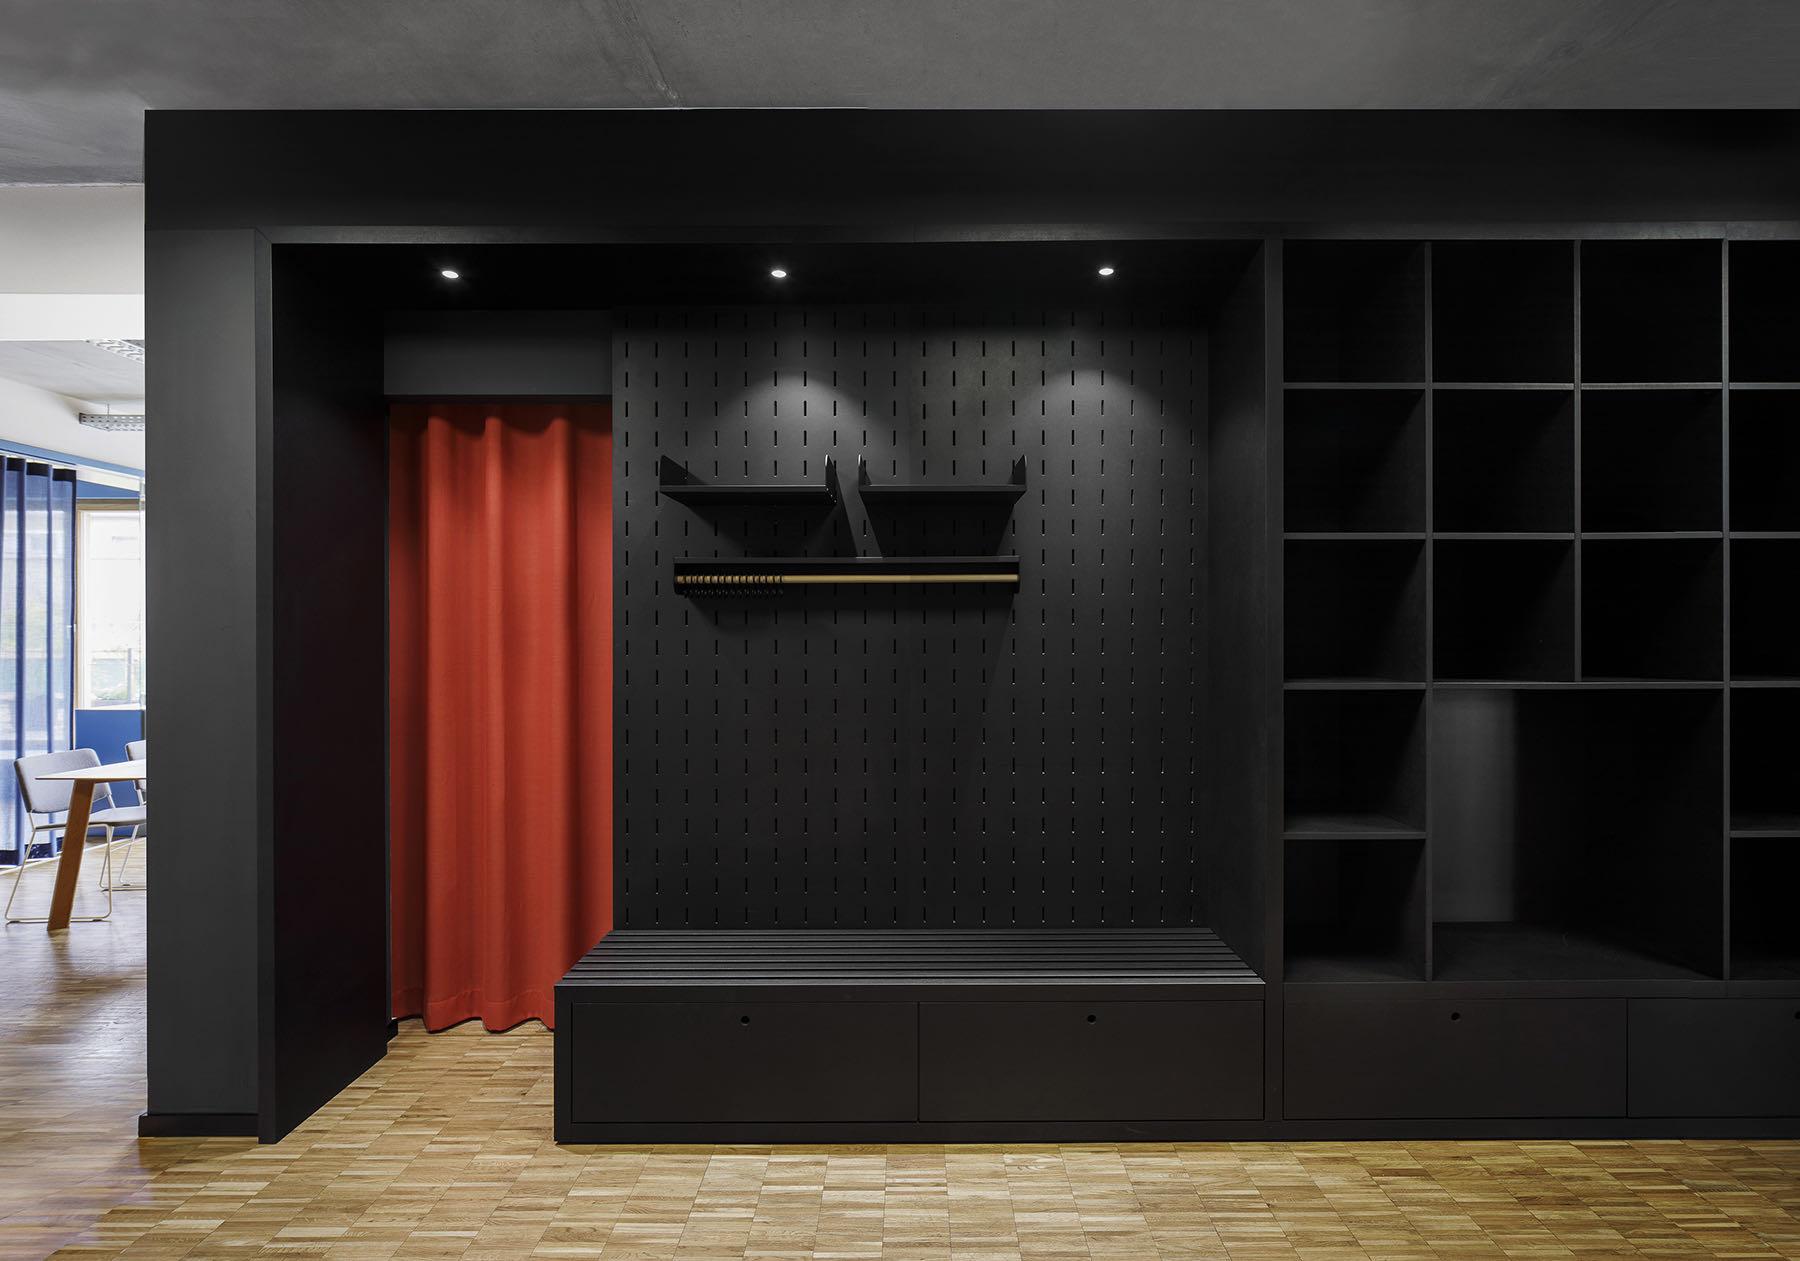 velokonzept-berlin-office-3